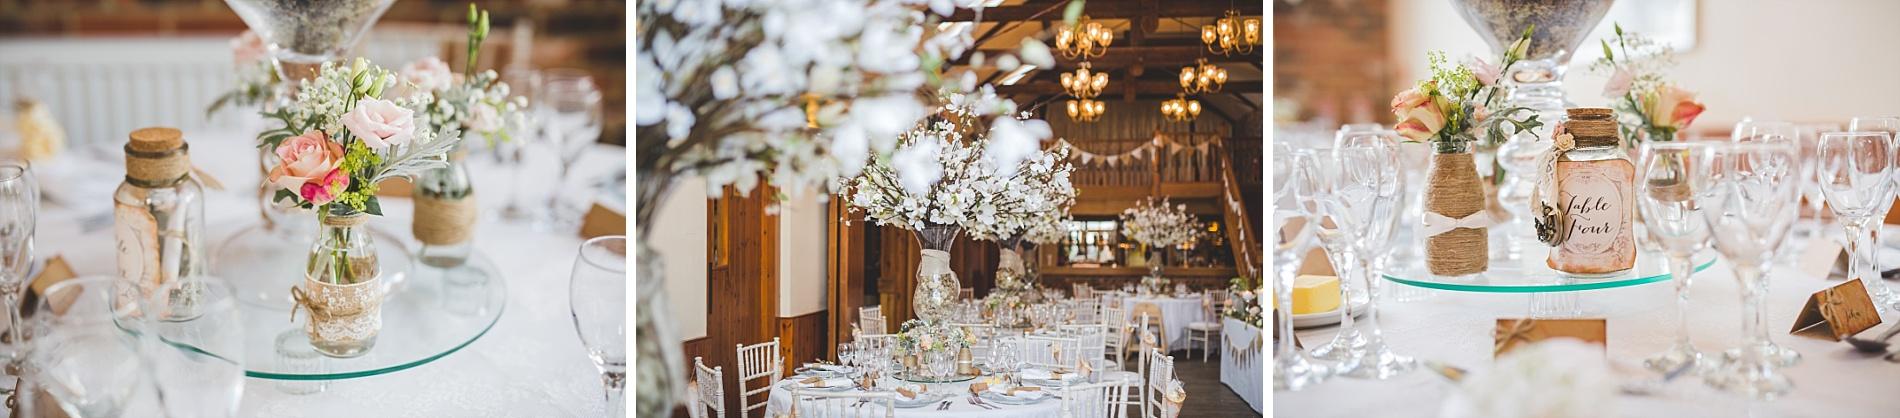 hall farm wedding photography (56)